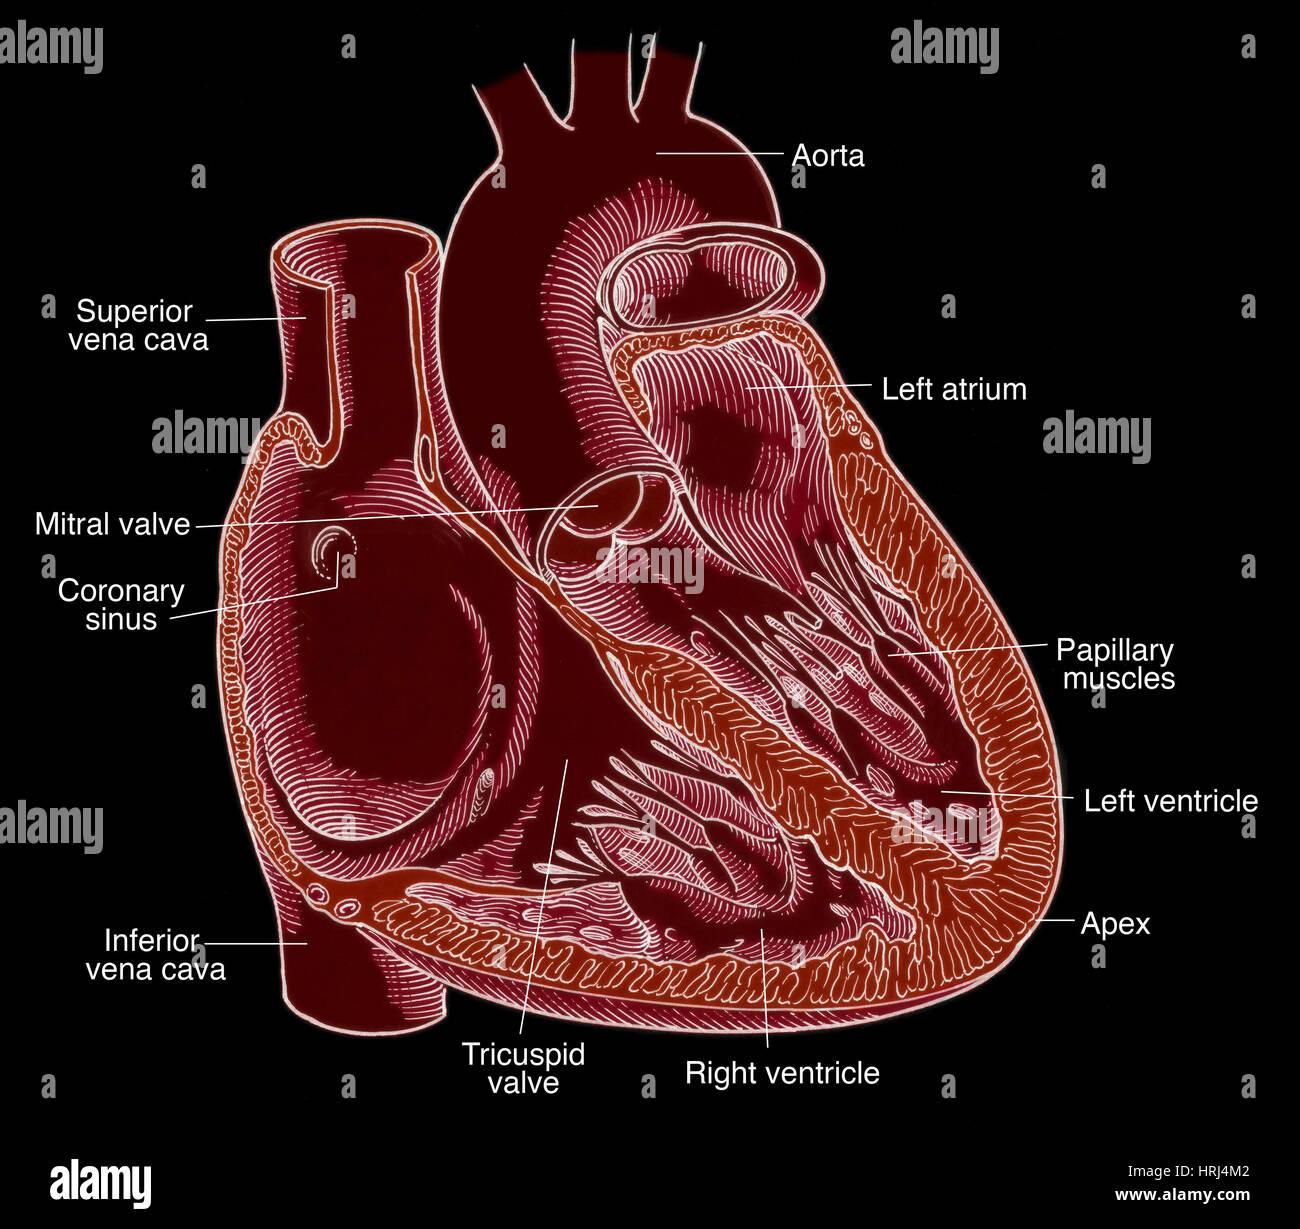 Illustration of Heart Anatomy Stock Photo: 135008498 - Alamy